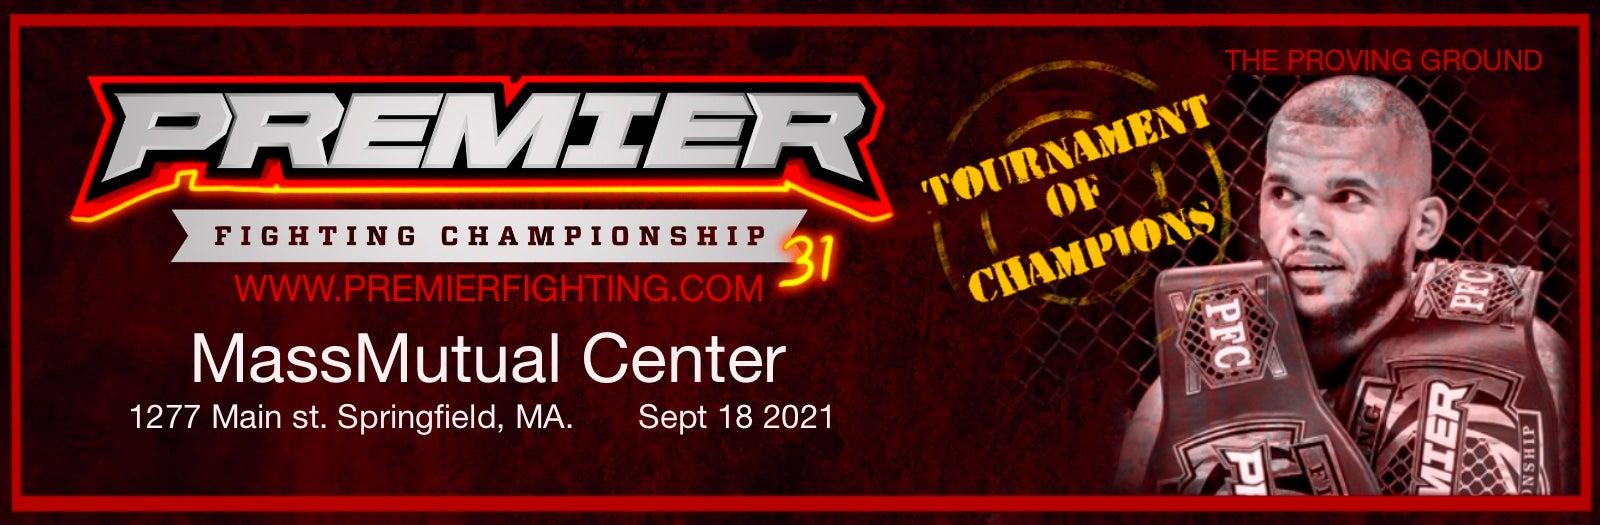 Premier Fighting Championship 31